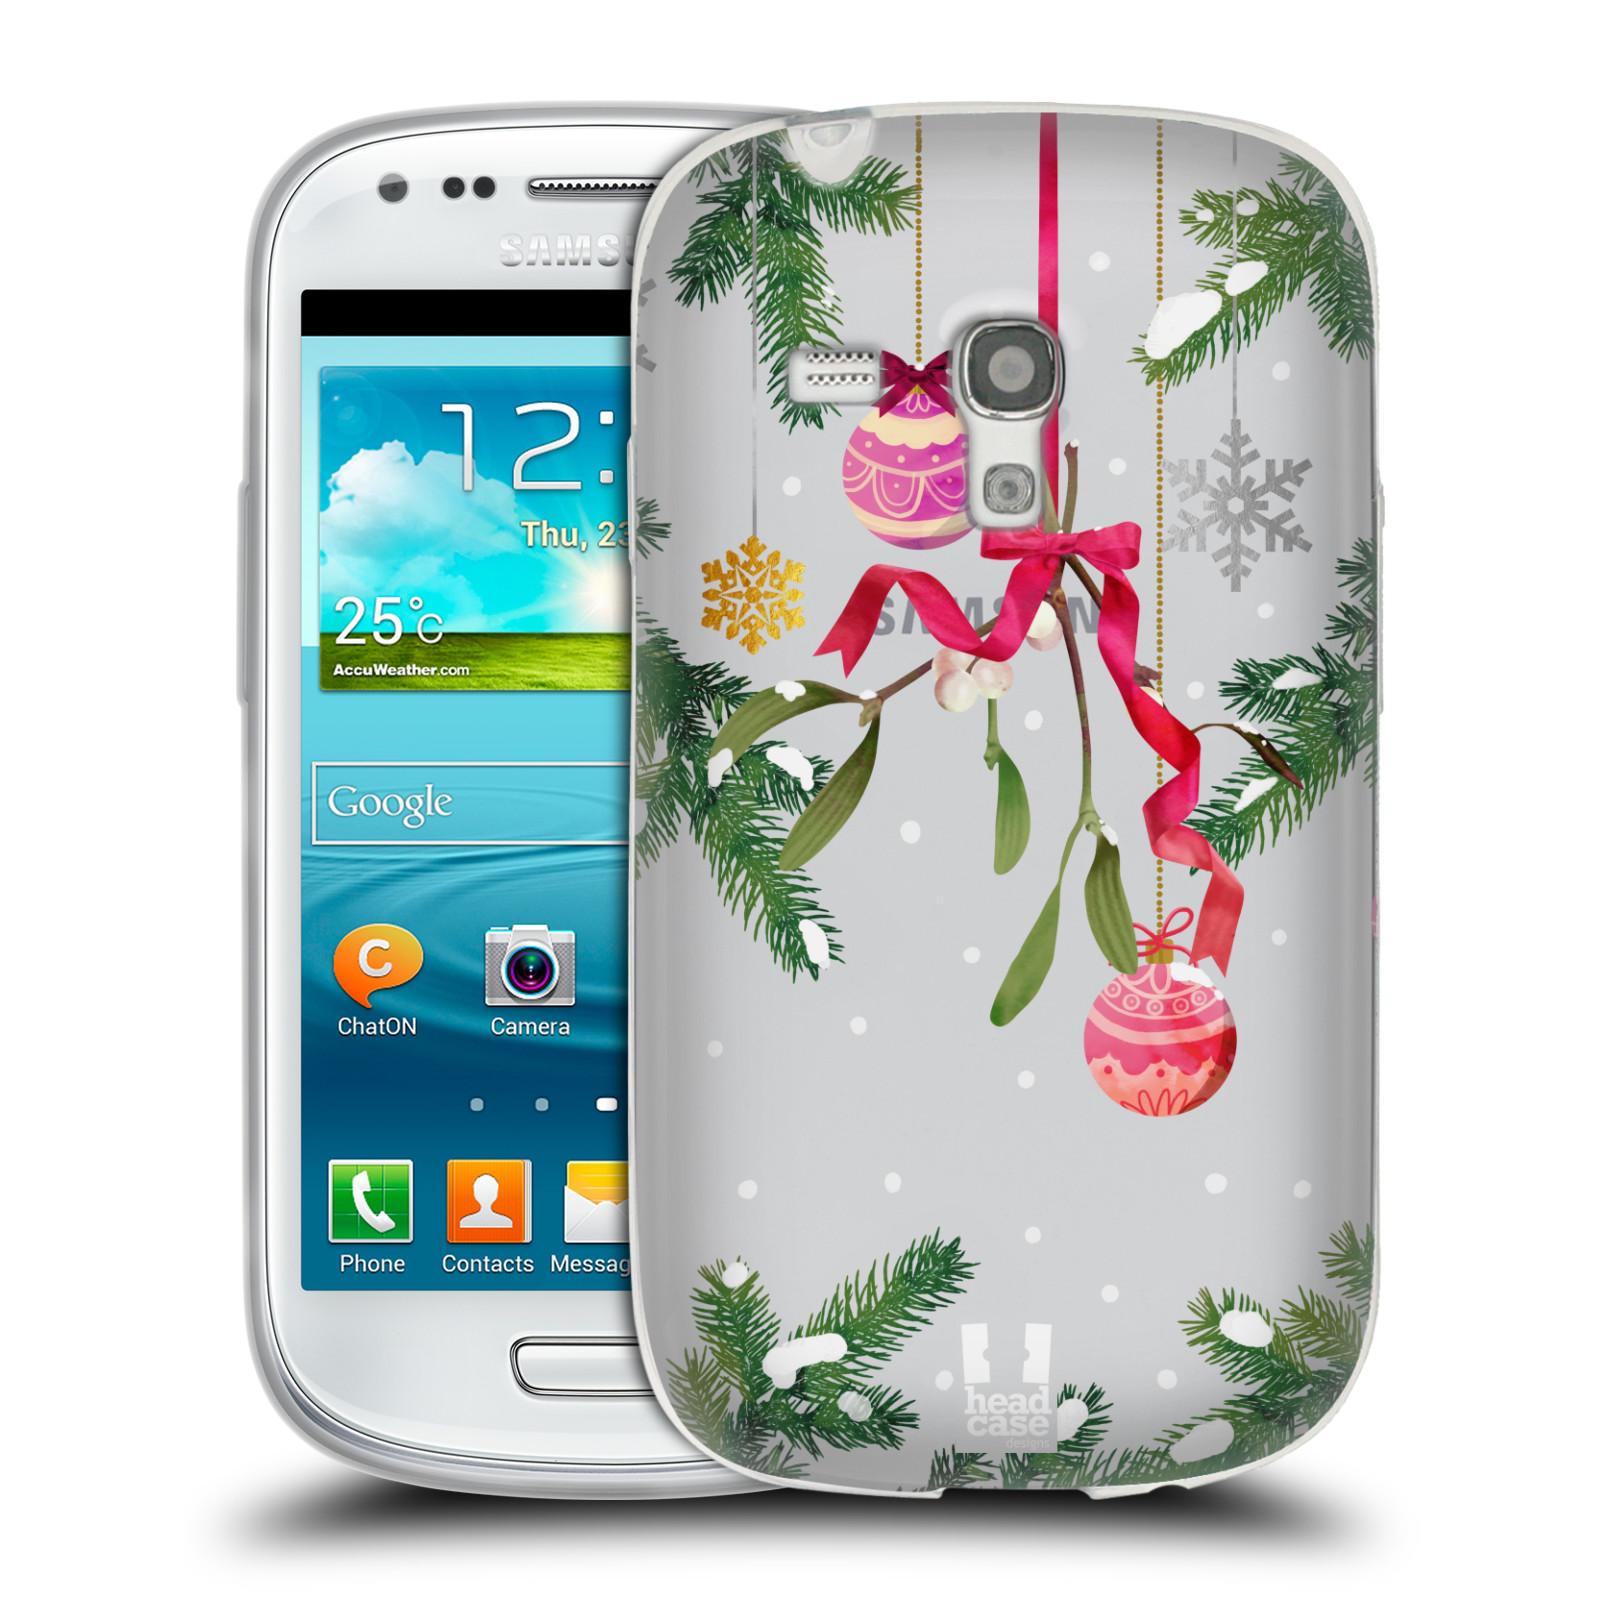 Silikonové pouzdro na mobil Samsung Galaxy S III Mini - Head Case - Větvičky a vánoční ozdoby